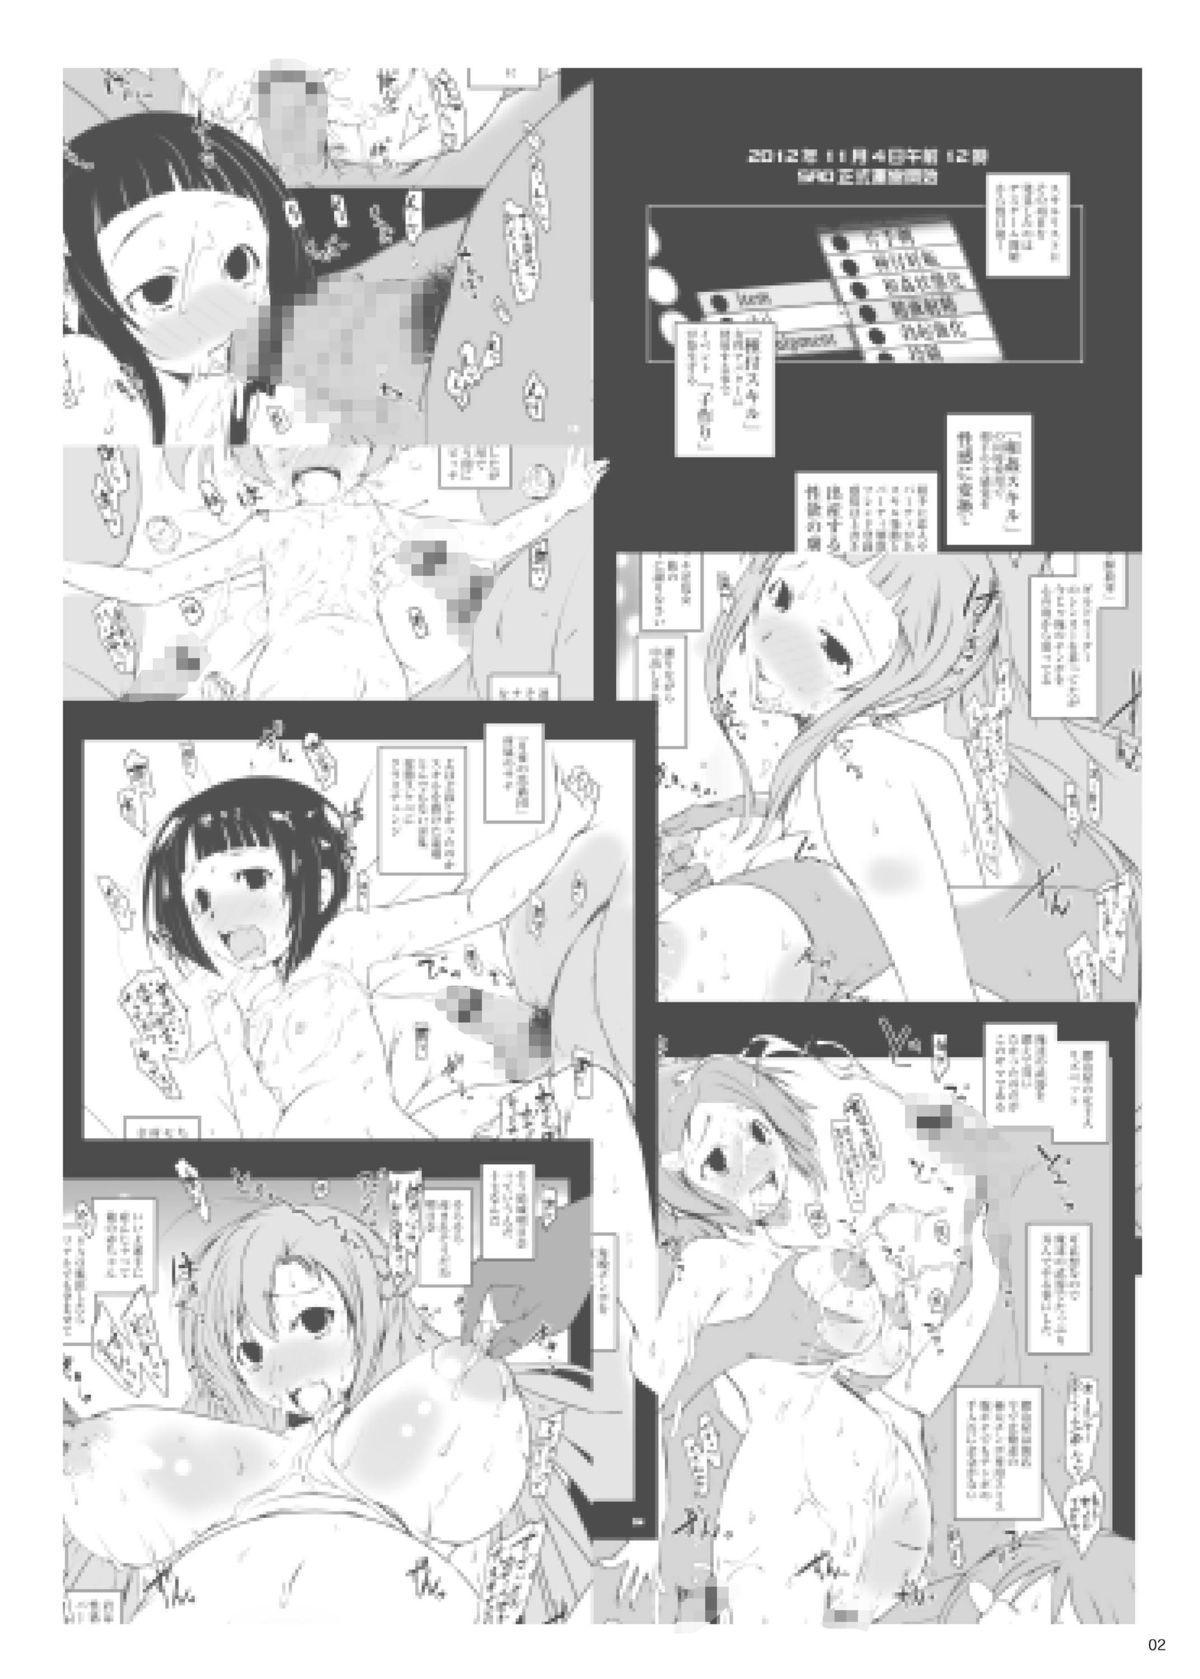 [Suitekiya (Suiteki-ka Yū-min)]Kennai Mating Scandal (1: Einclad / 2: Fairy Dance) SAO The Complete (Sword Art Online) 17